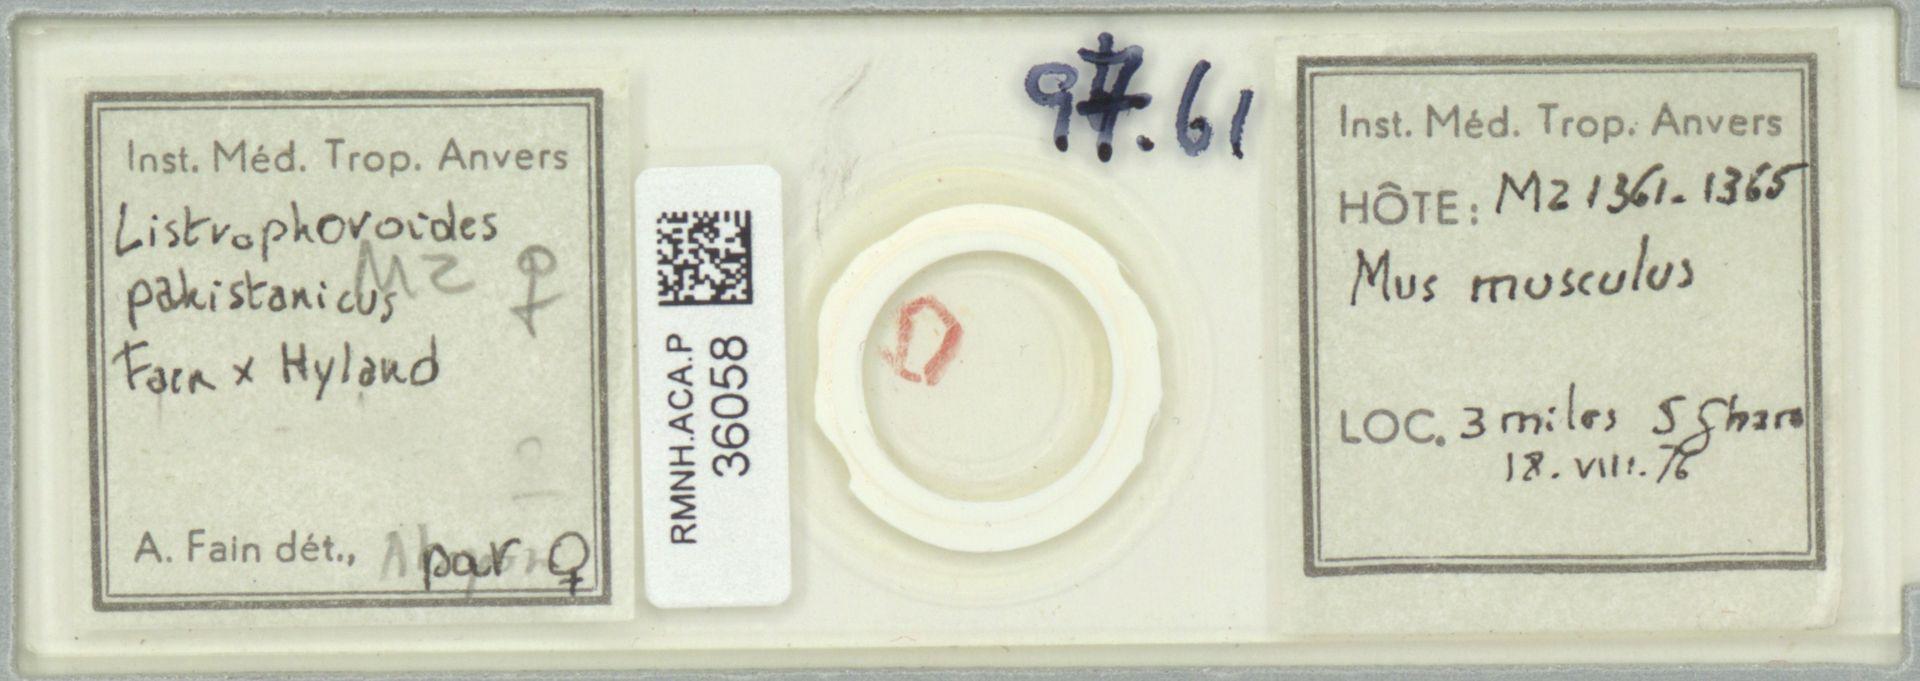 RMNH.ACA.P.36058 | Listrophoroides pakistanicus Fain & Hyland